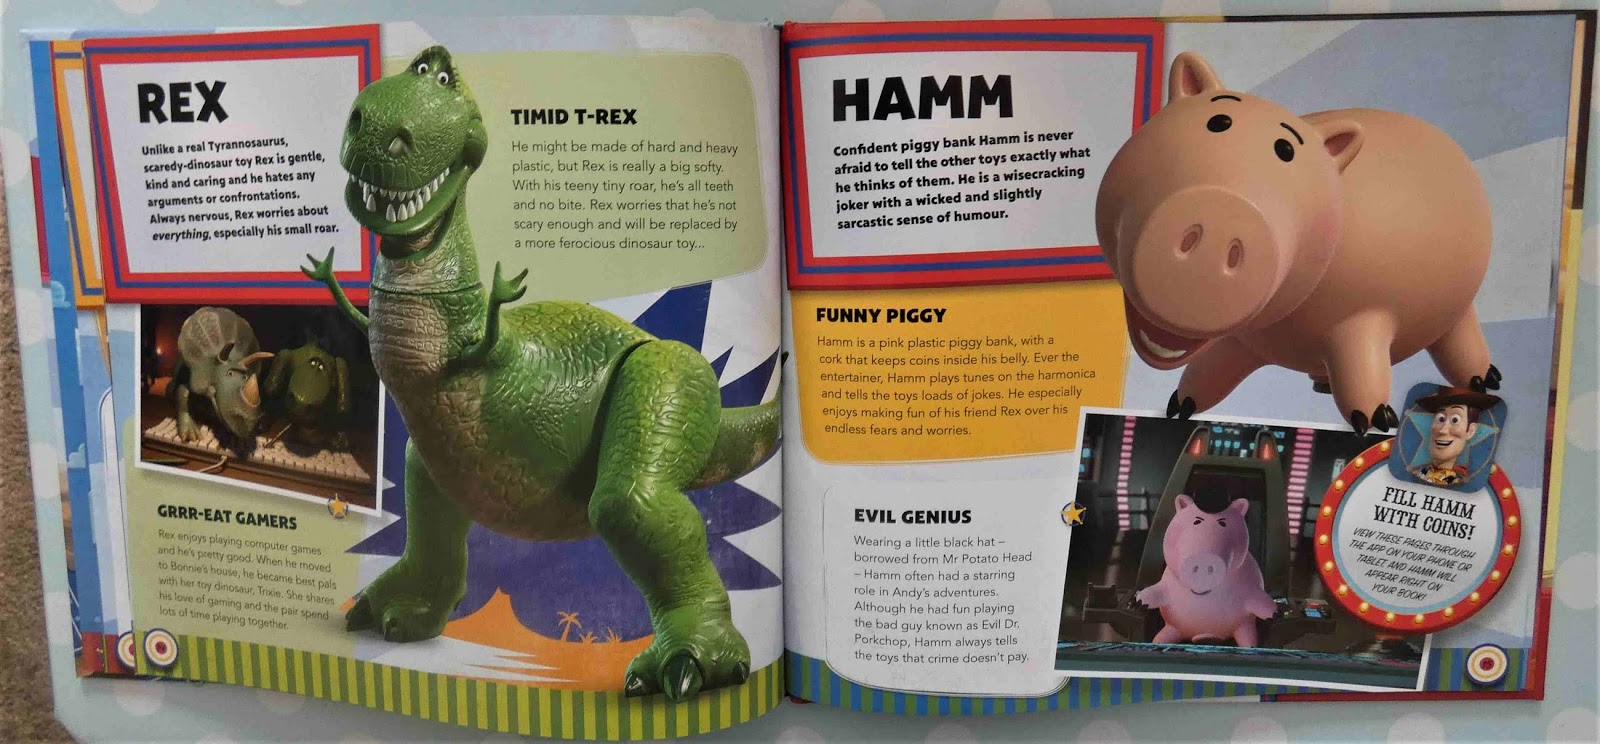 Disney Pixar Toy Story : Woody's Augmented Reality Adventure